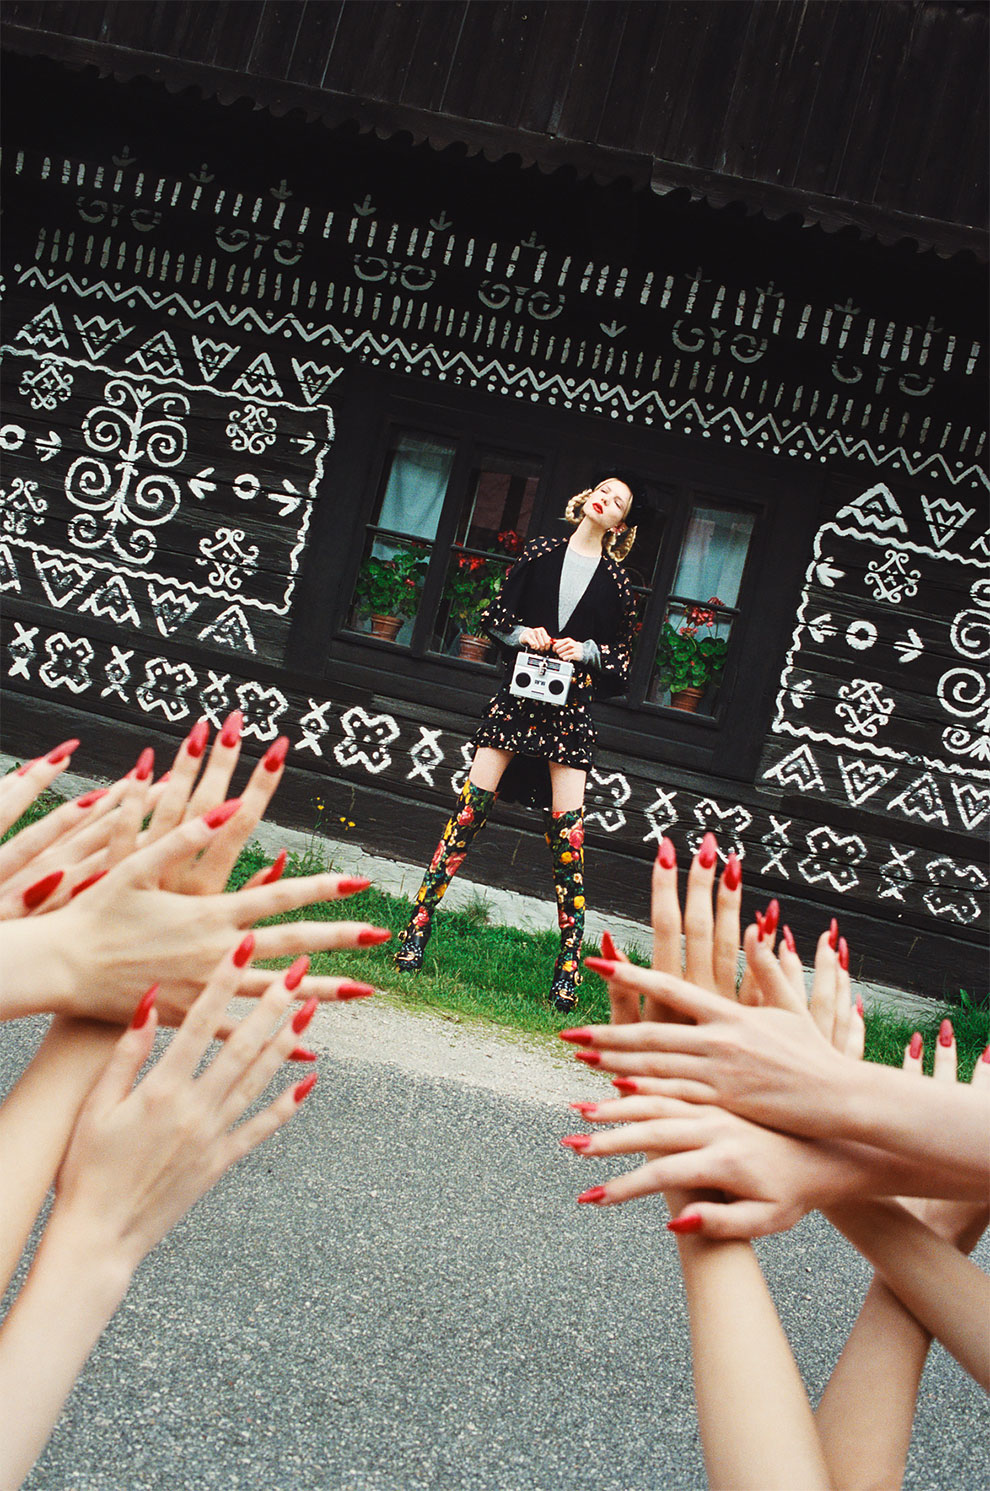 Чешский фотограф Михал Пуделка девочки, девочки, девочки (2).jpg